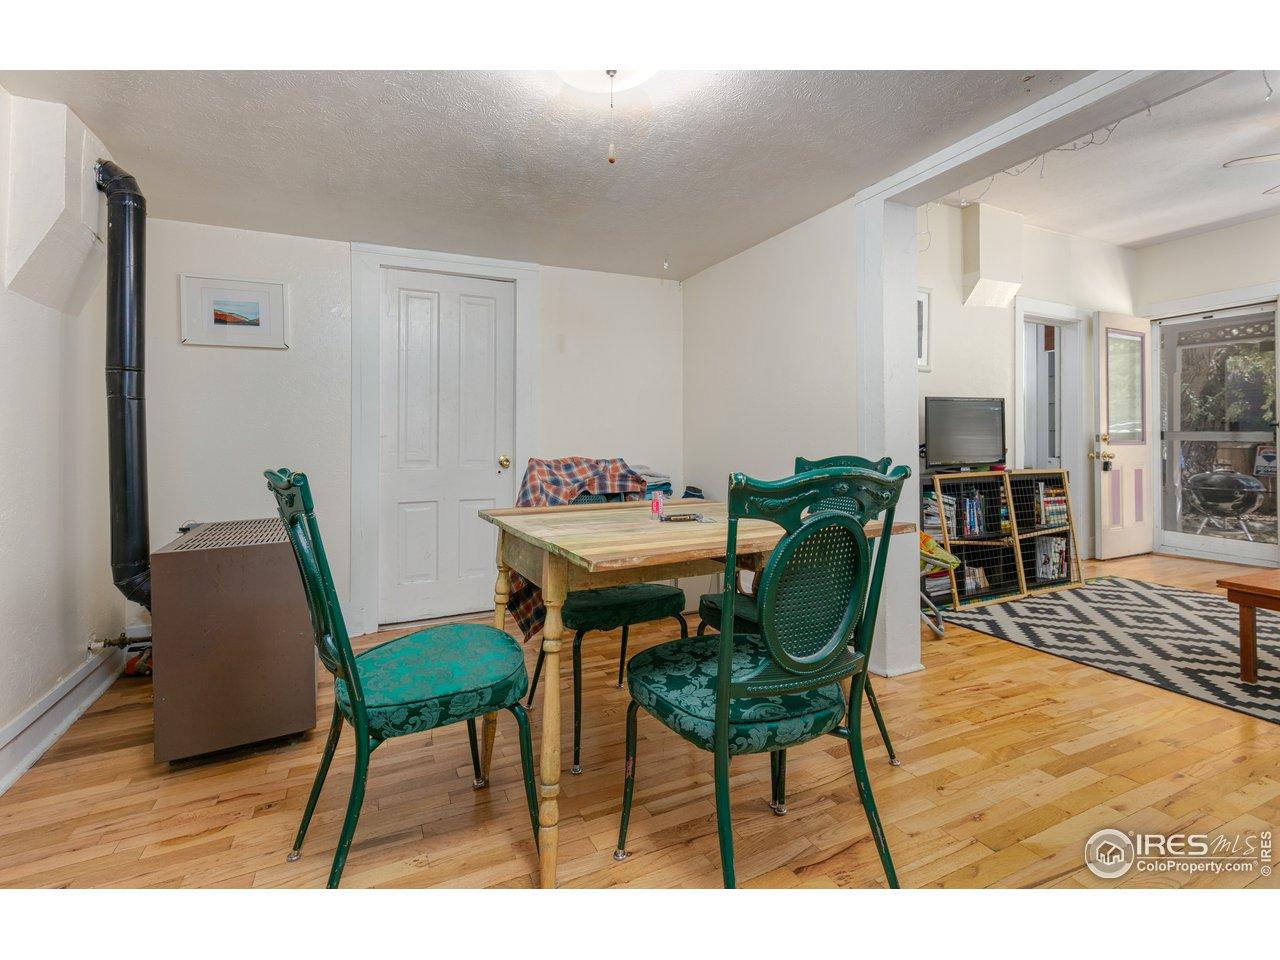 Unit 2 Dining Room